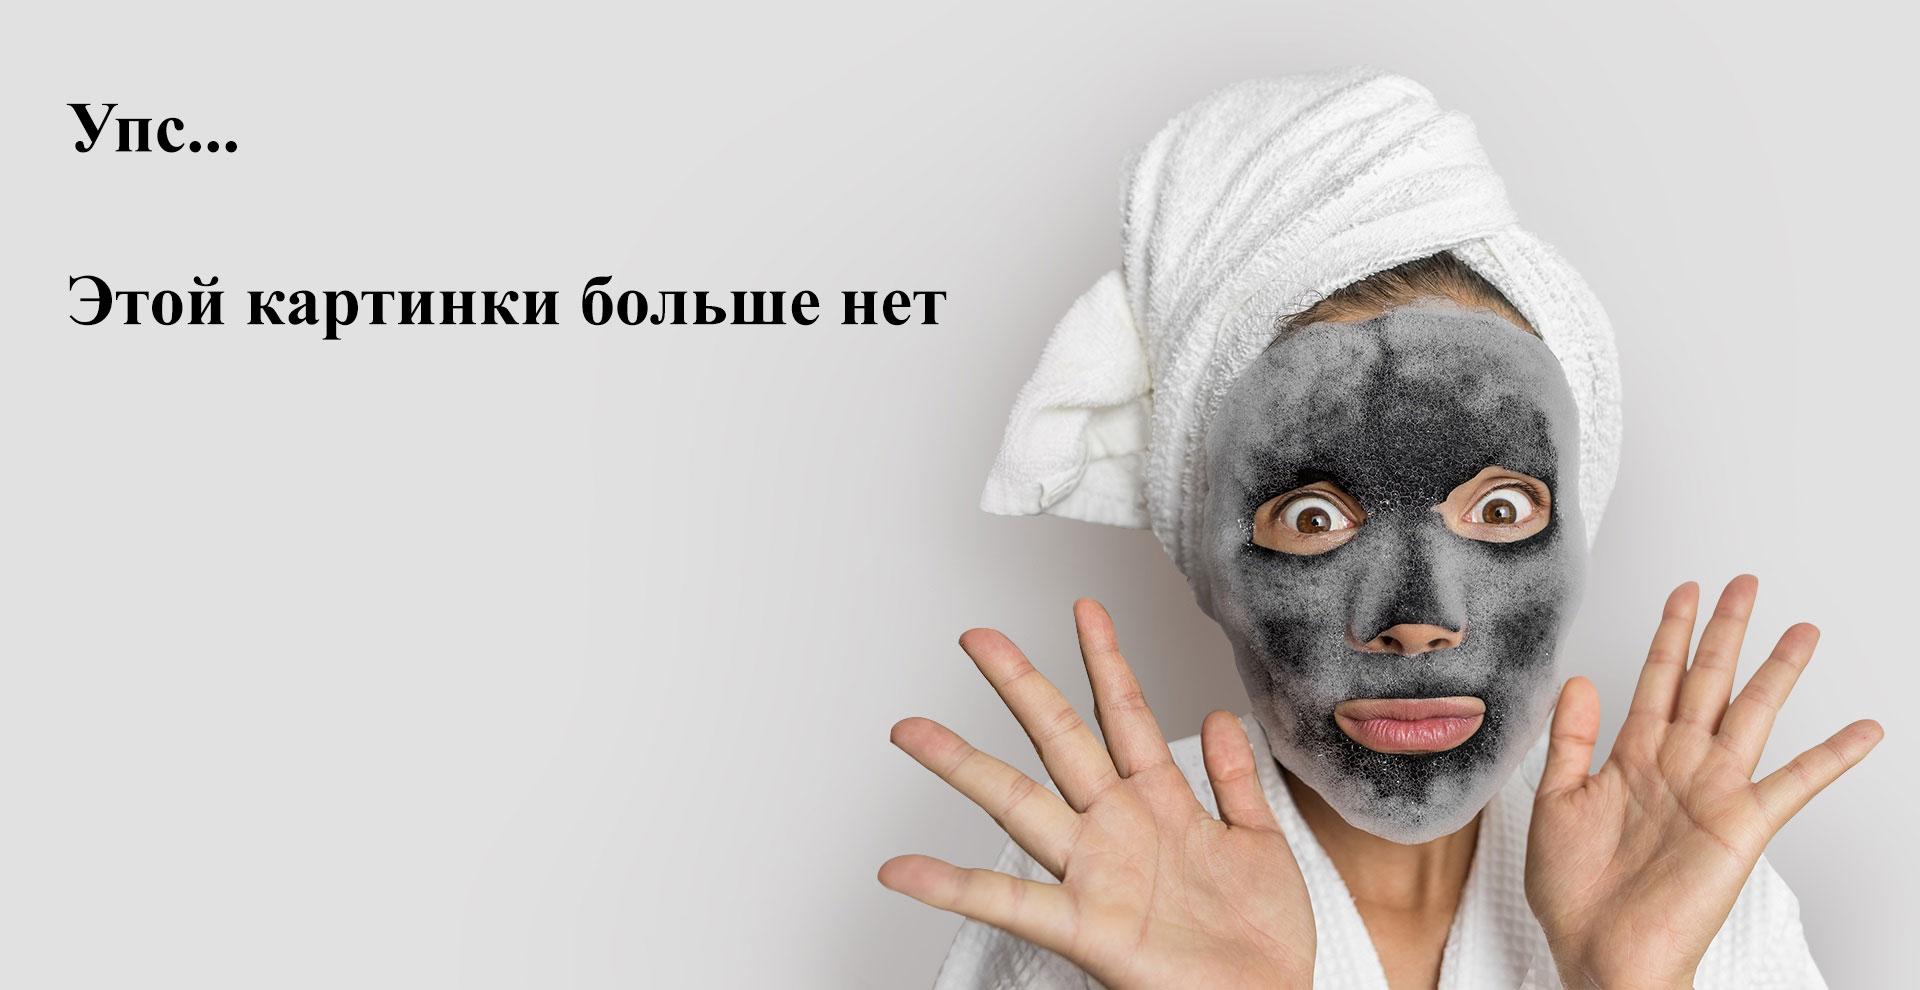 Domix, Гиалуроновая мицеллярная вода Sweet Time «Ежевика», 210 мл